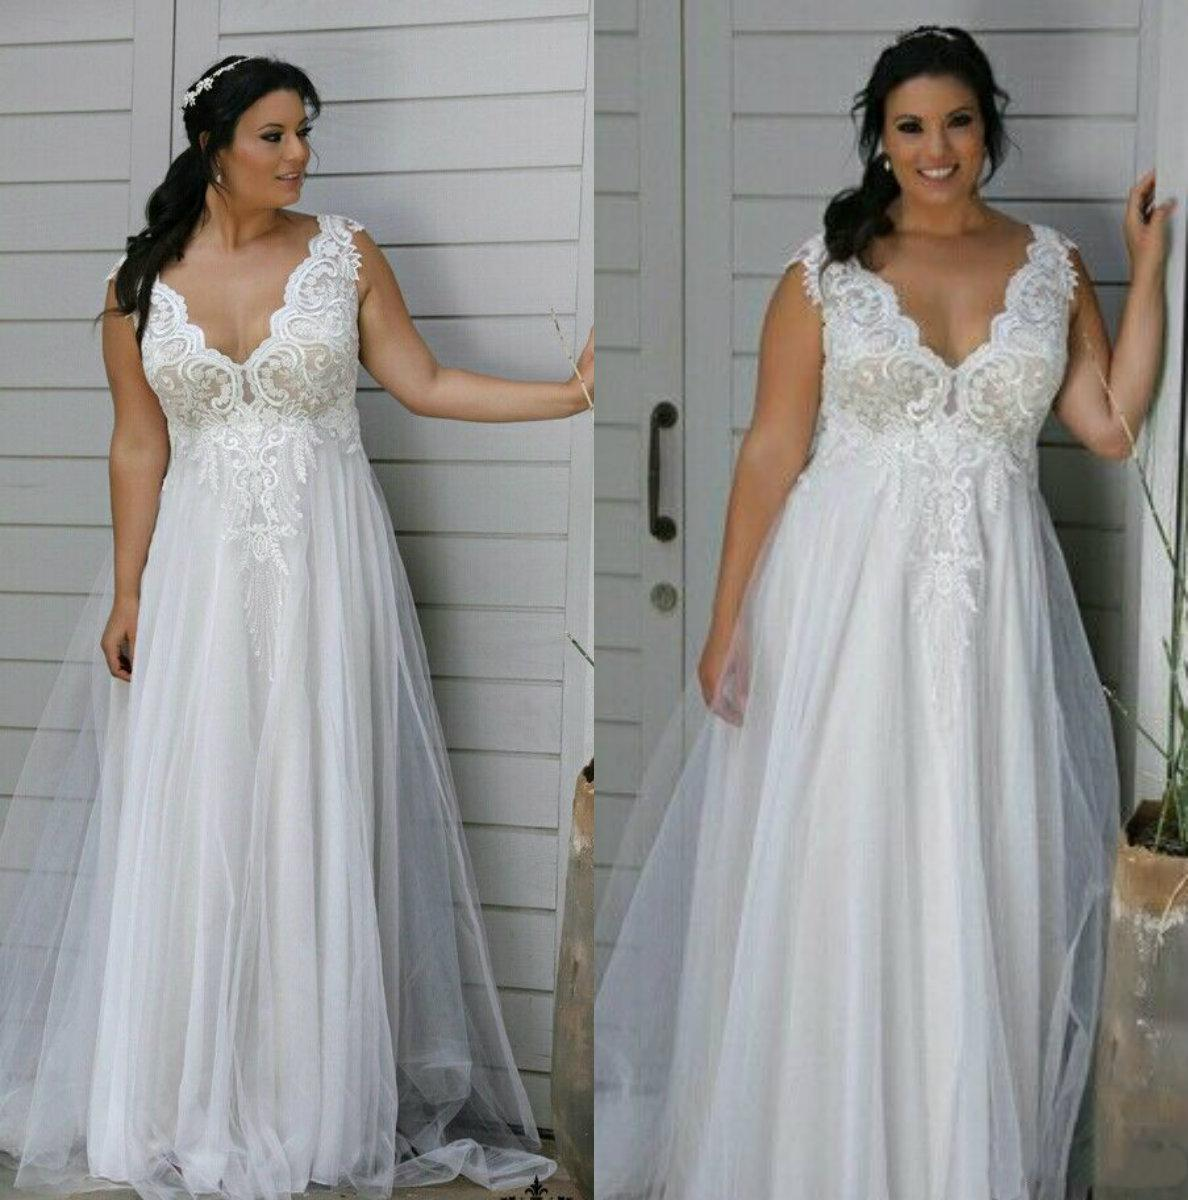 Plus Size Empire Waist Wedding Dress: Discount Plus Size Wedding Dress Empire High Waist Lace